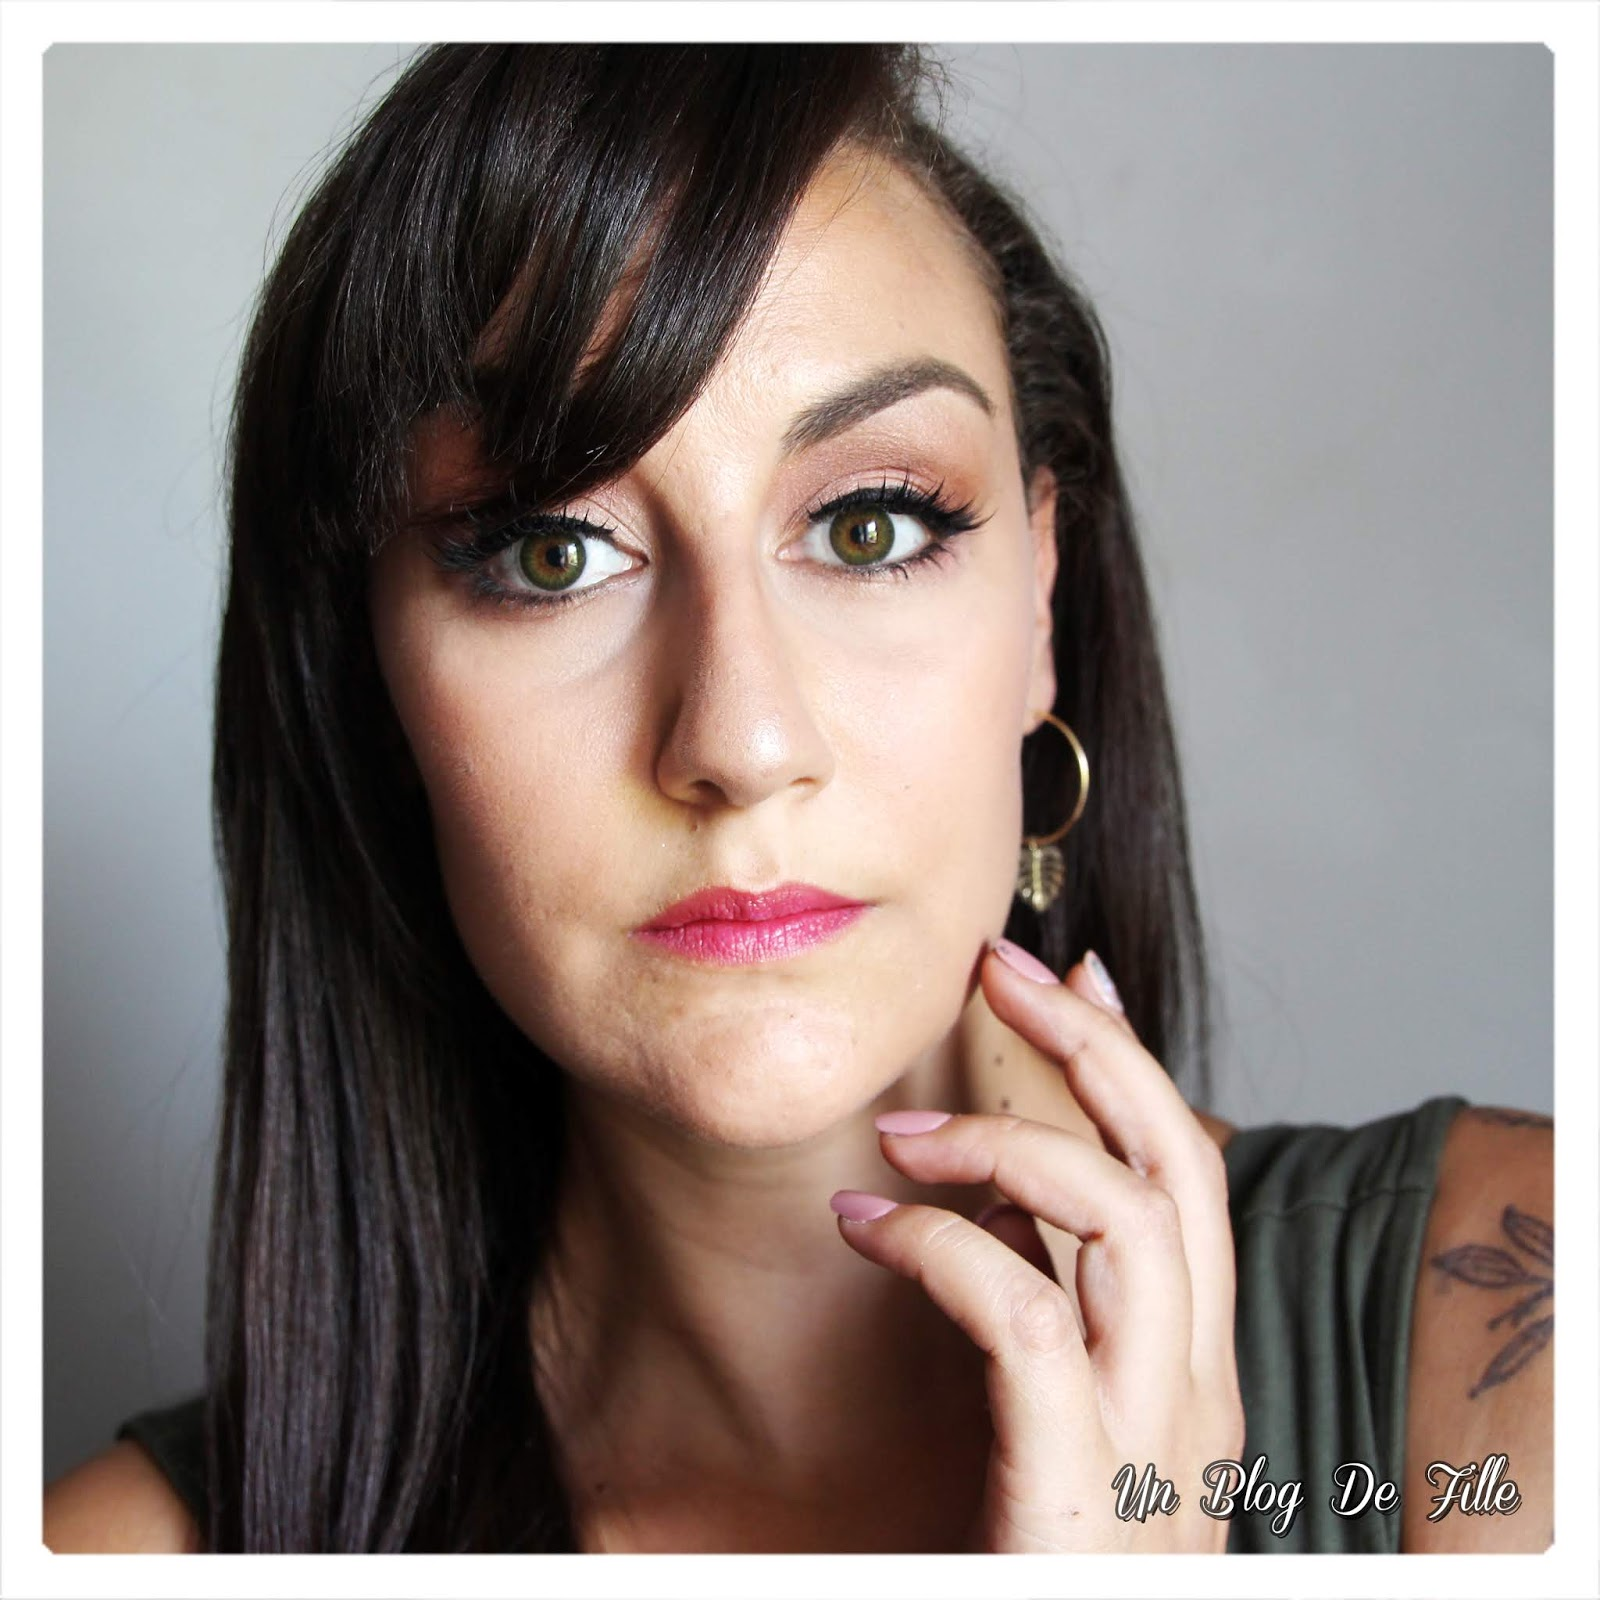 http://www.unblogdefille.fr/2018/06/maquillage-hexa-pink-nude-de-kiss-new.html